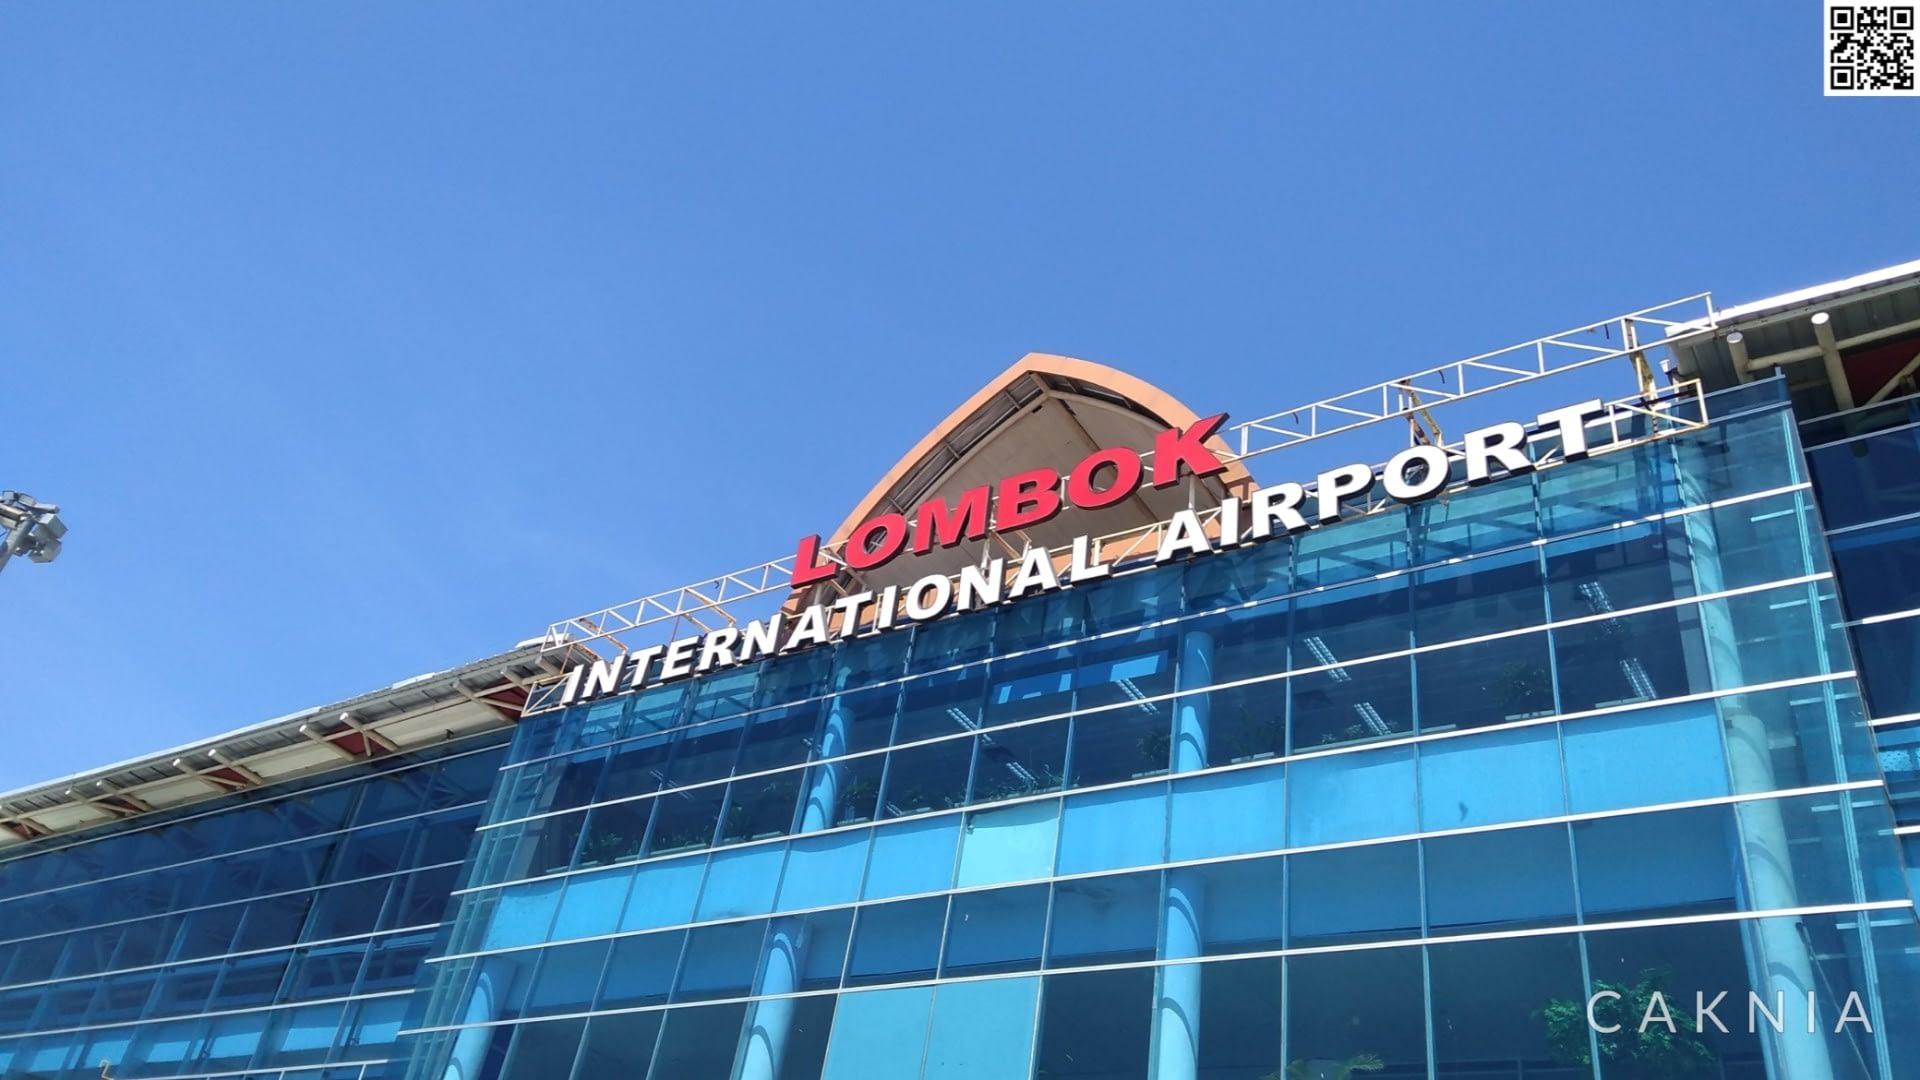 Lombok International Airport (LIA)